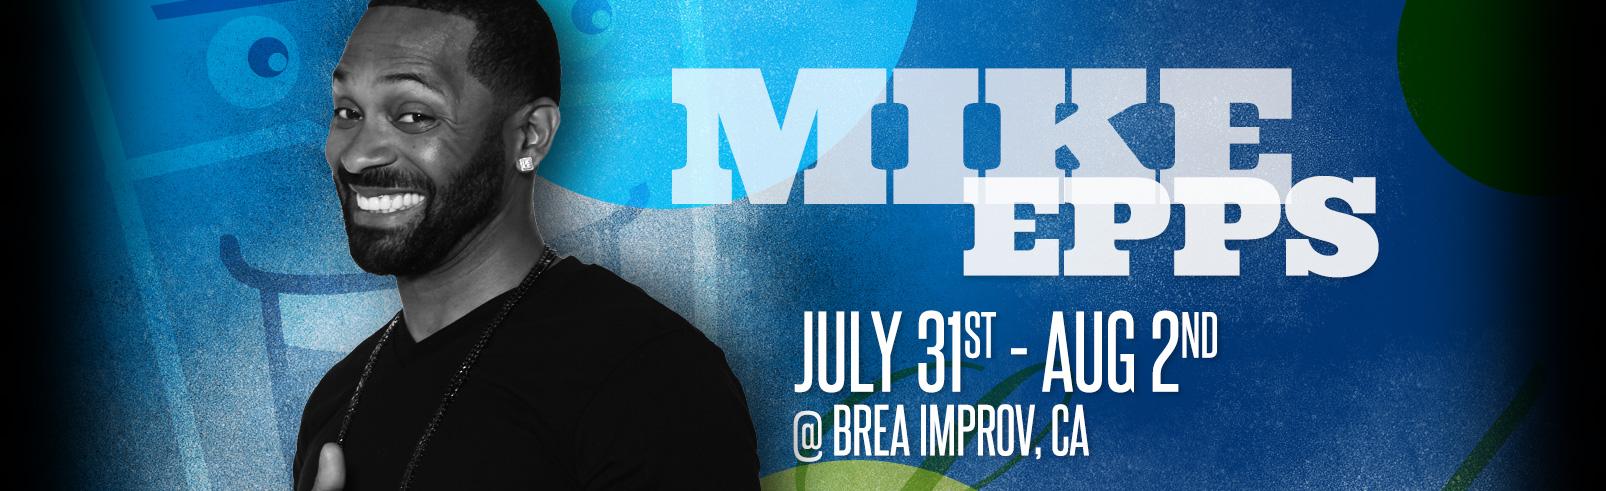 Mike Epps @ Brea Improv